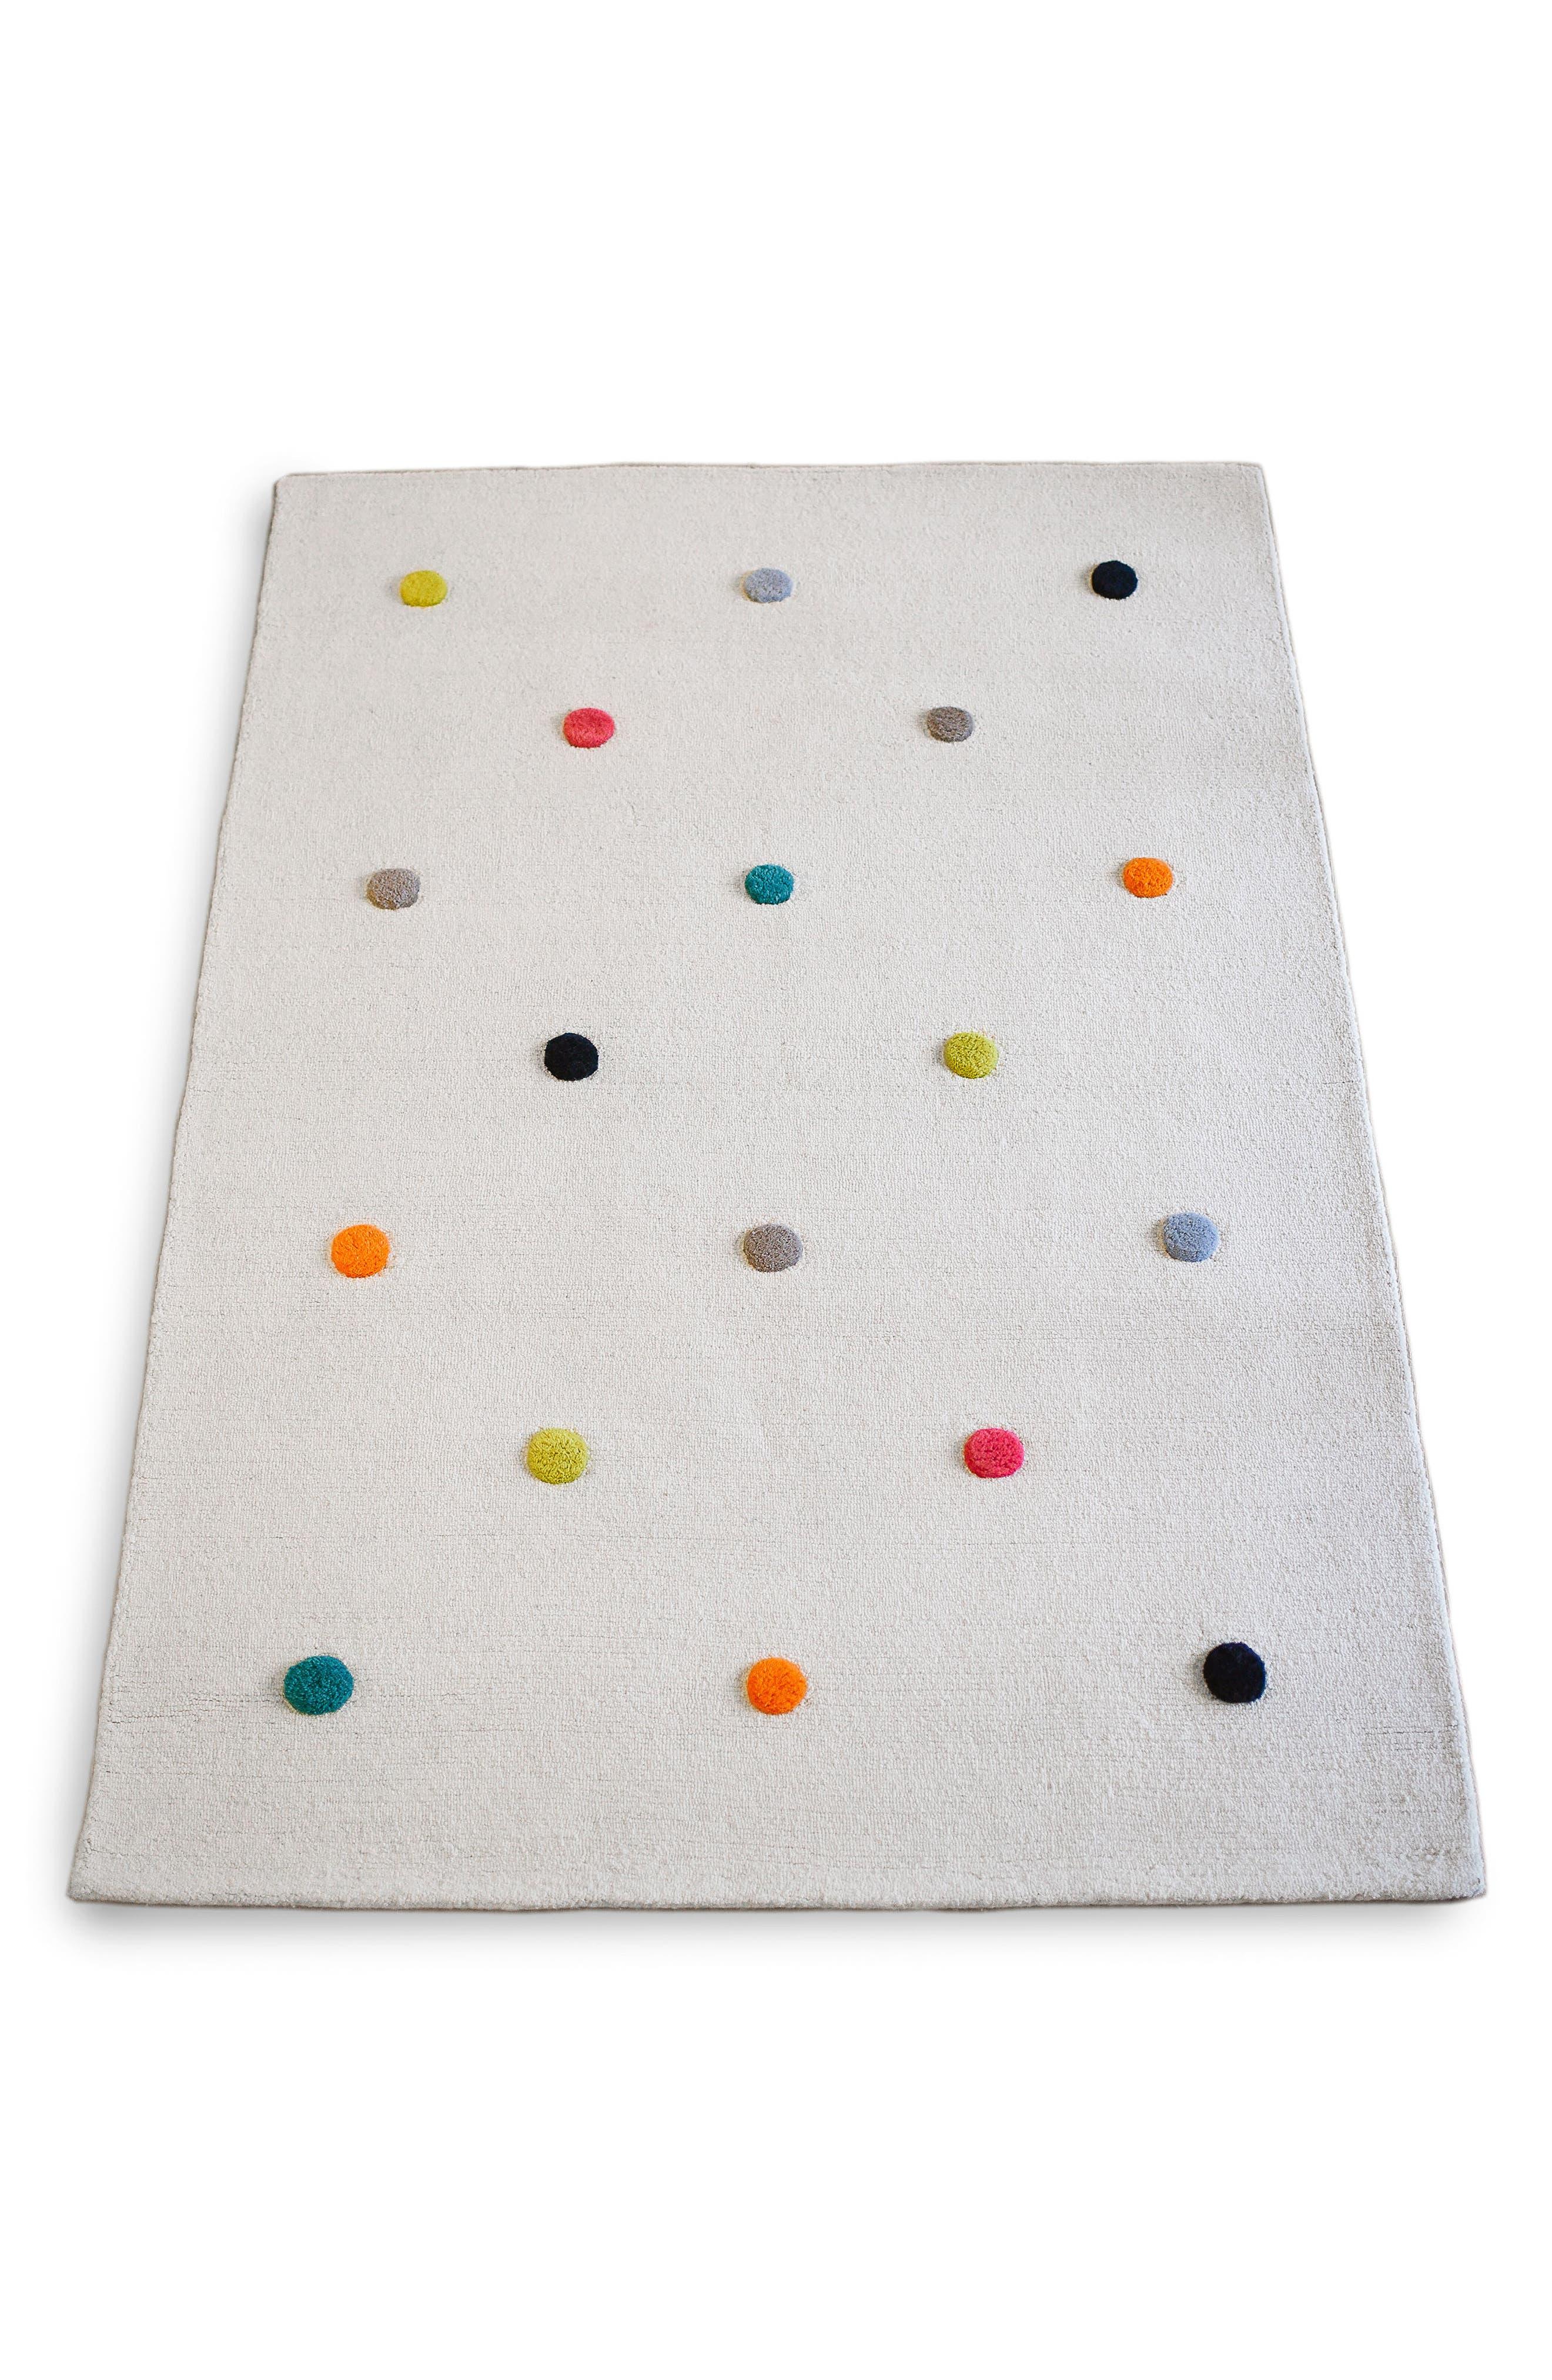 Multicolor Pompom Wool Rug,                             Main thumbnail 1, color,                             MULTI